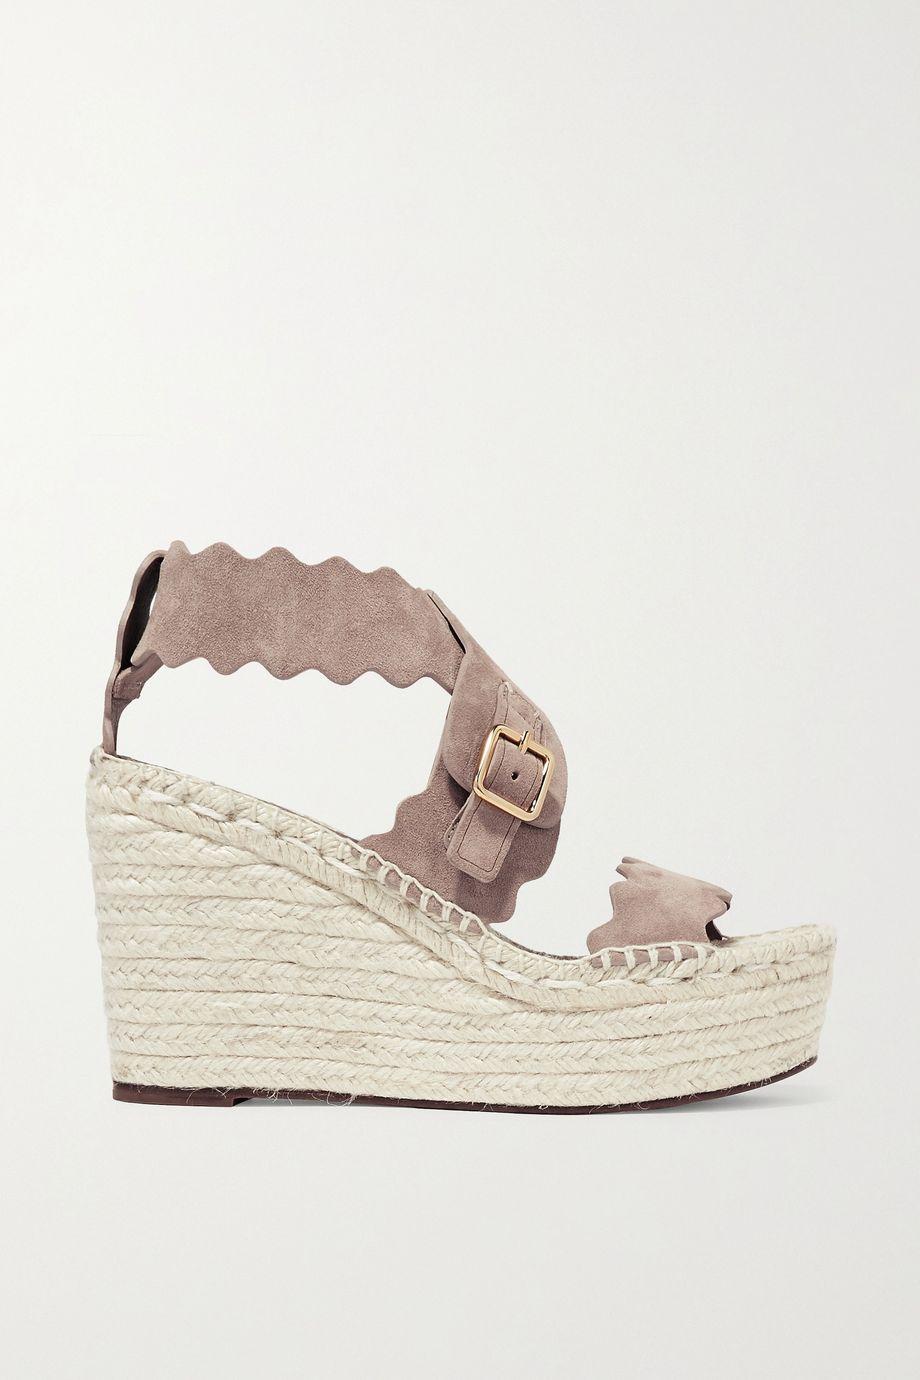 Chloé Lauren scalloped suede espadrille wedge sandals